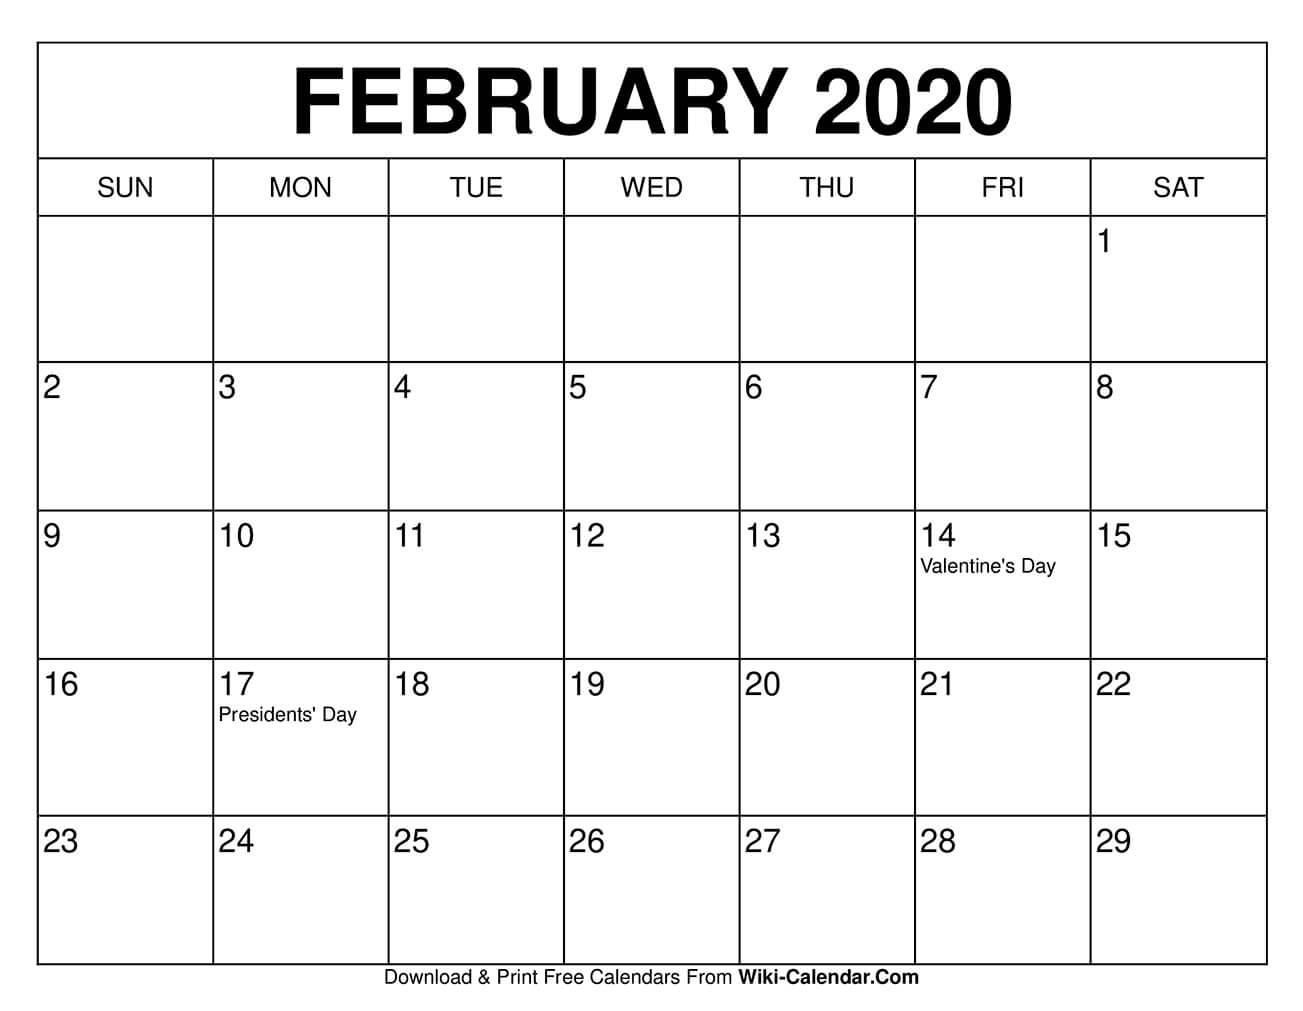 Free Printable February 2020 Calendars  February 2020 Calendar